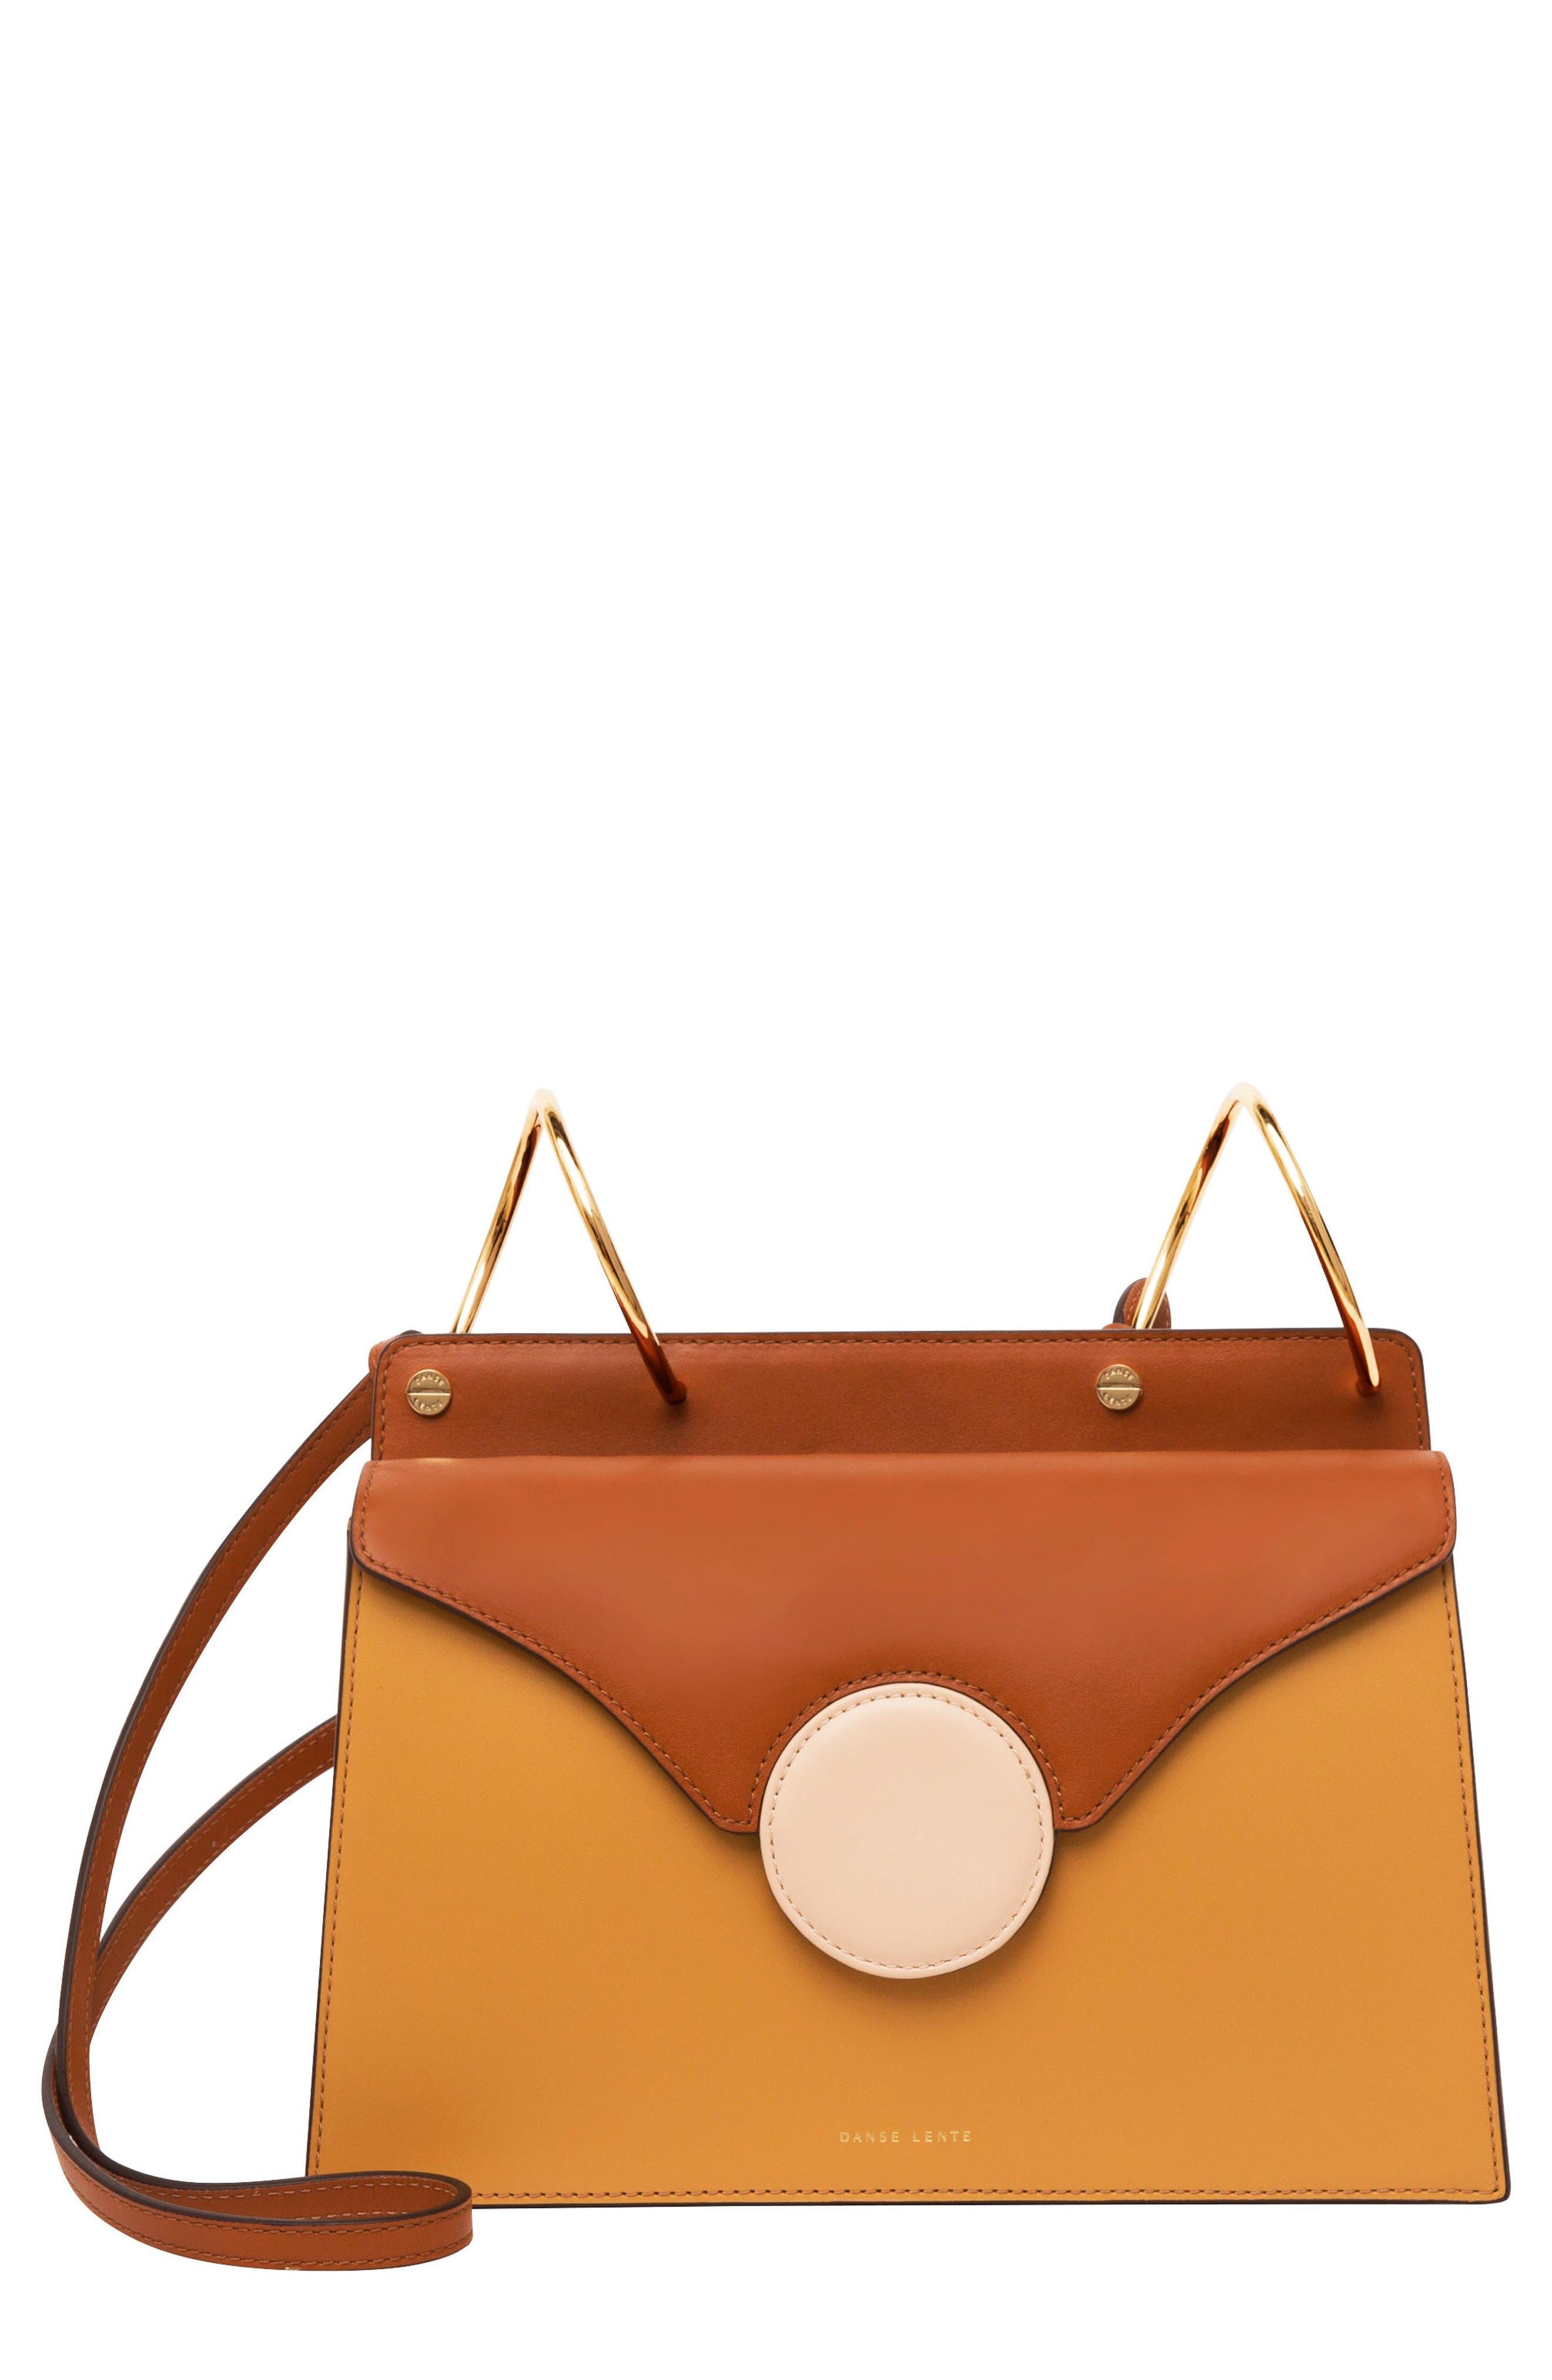 Phoebe Leather Crossbody Bag,                             Main thumbnail 1, color,                             SAND/ AMBER